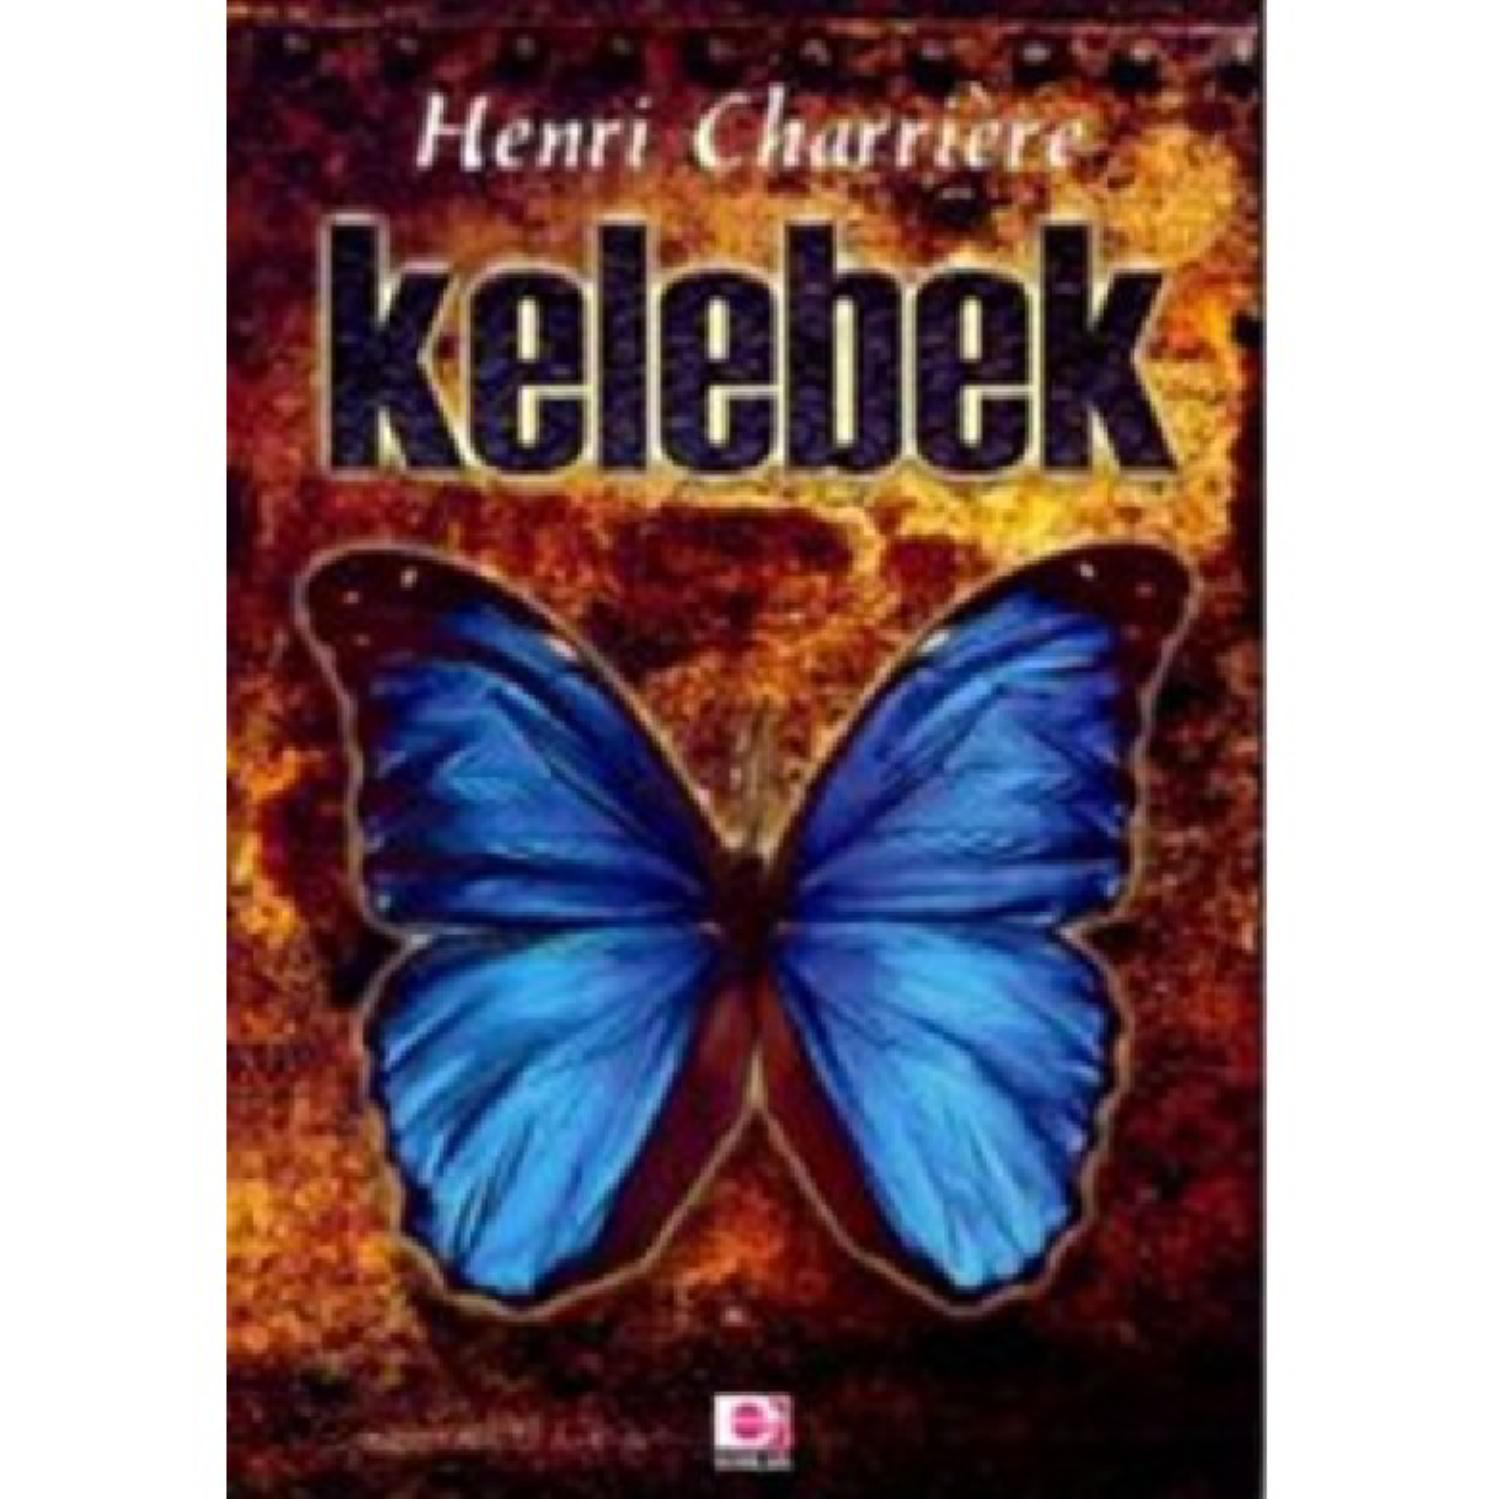 Kelebek- Henri Charriere By Fahriye Ayaz - Issuu dedans Pot Rouge Jardin